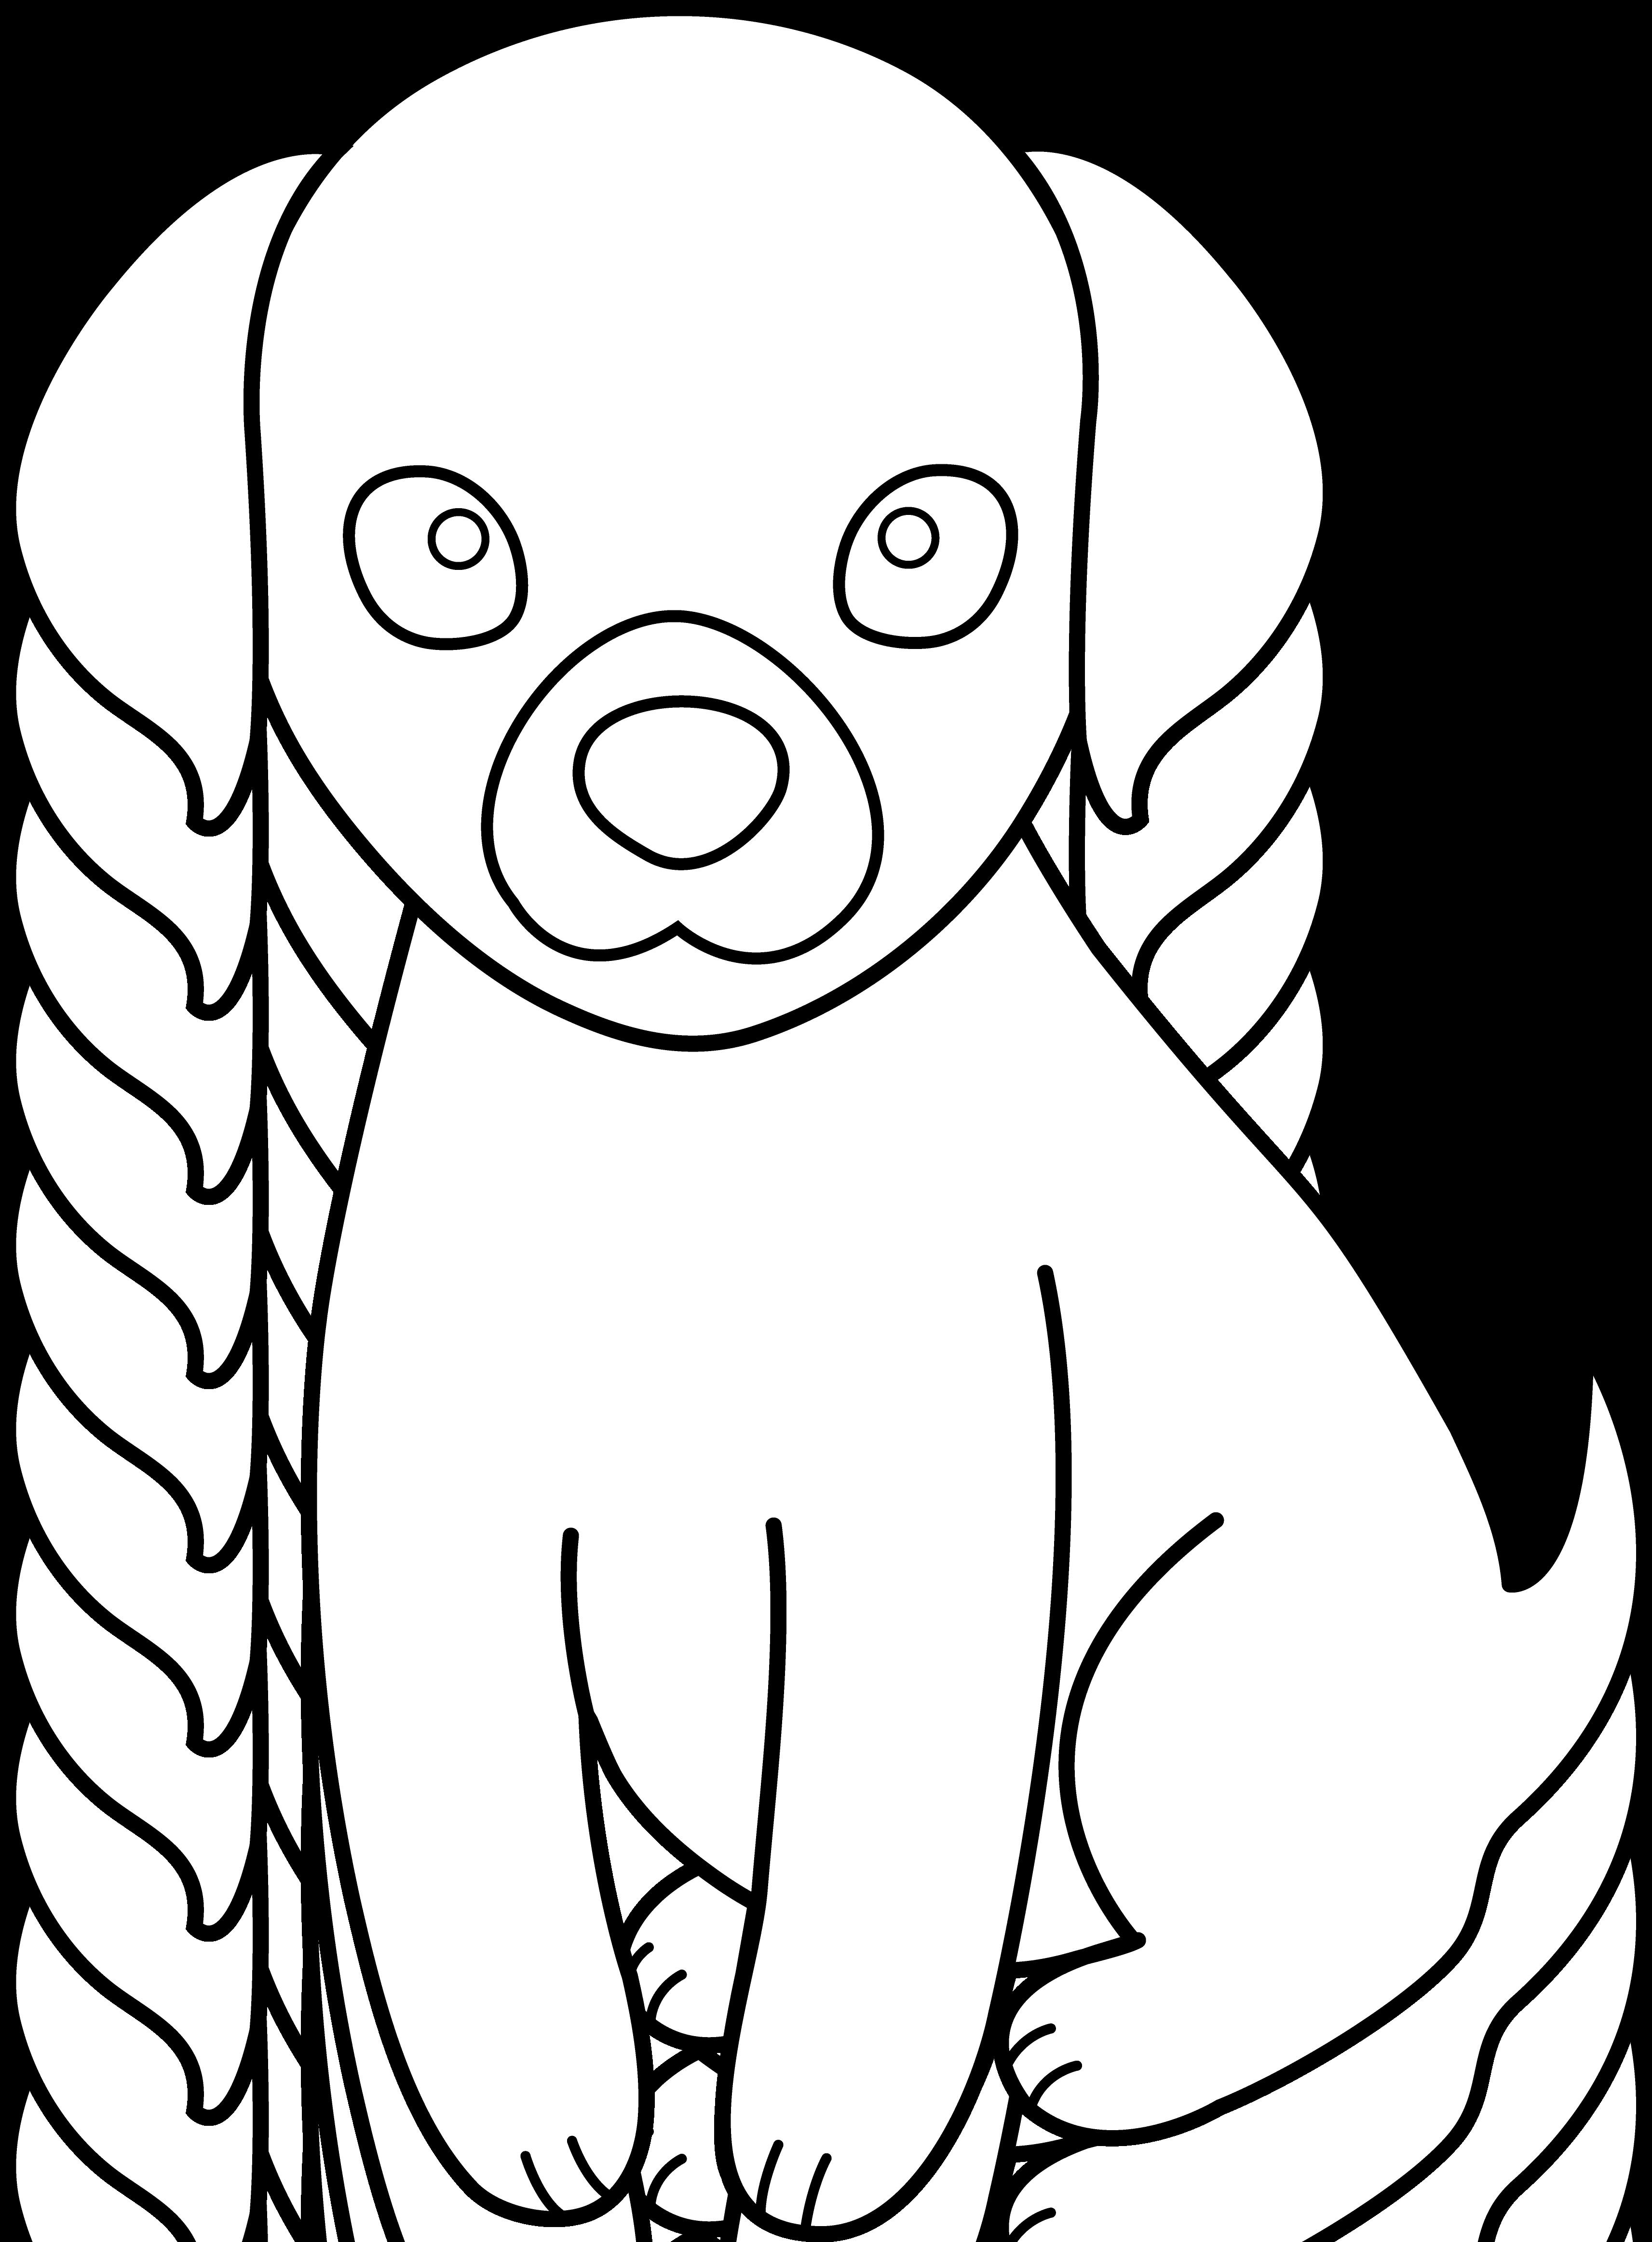 Cute puppy dog clipart black and white jpg freeuse HD Black And White Puppy Dog House Clipart Uploaded By - Cartoon ... jpg freeuse